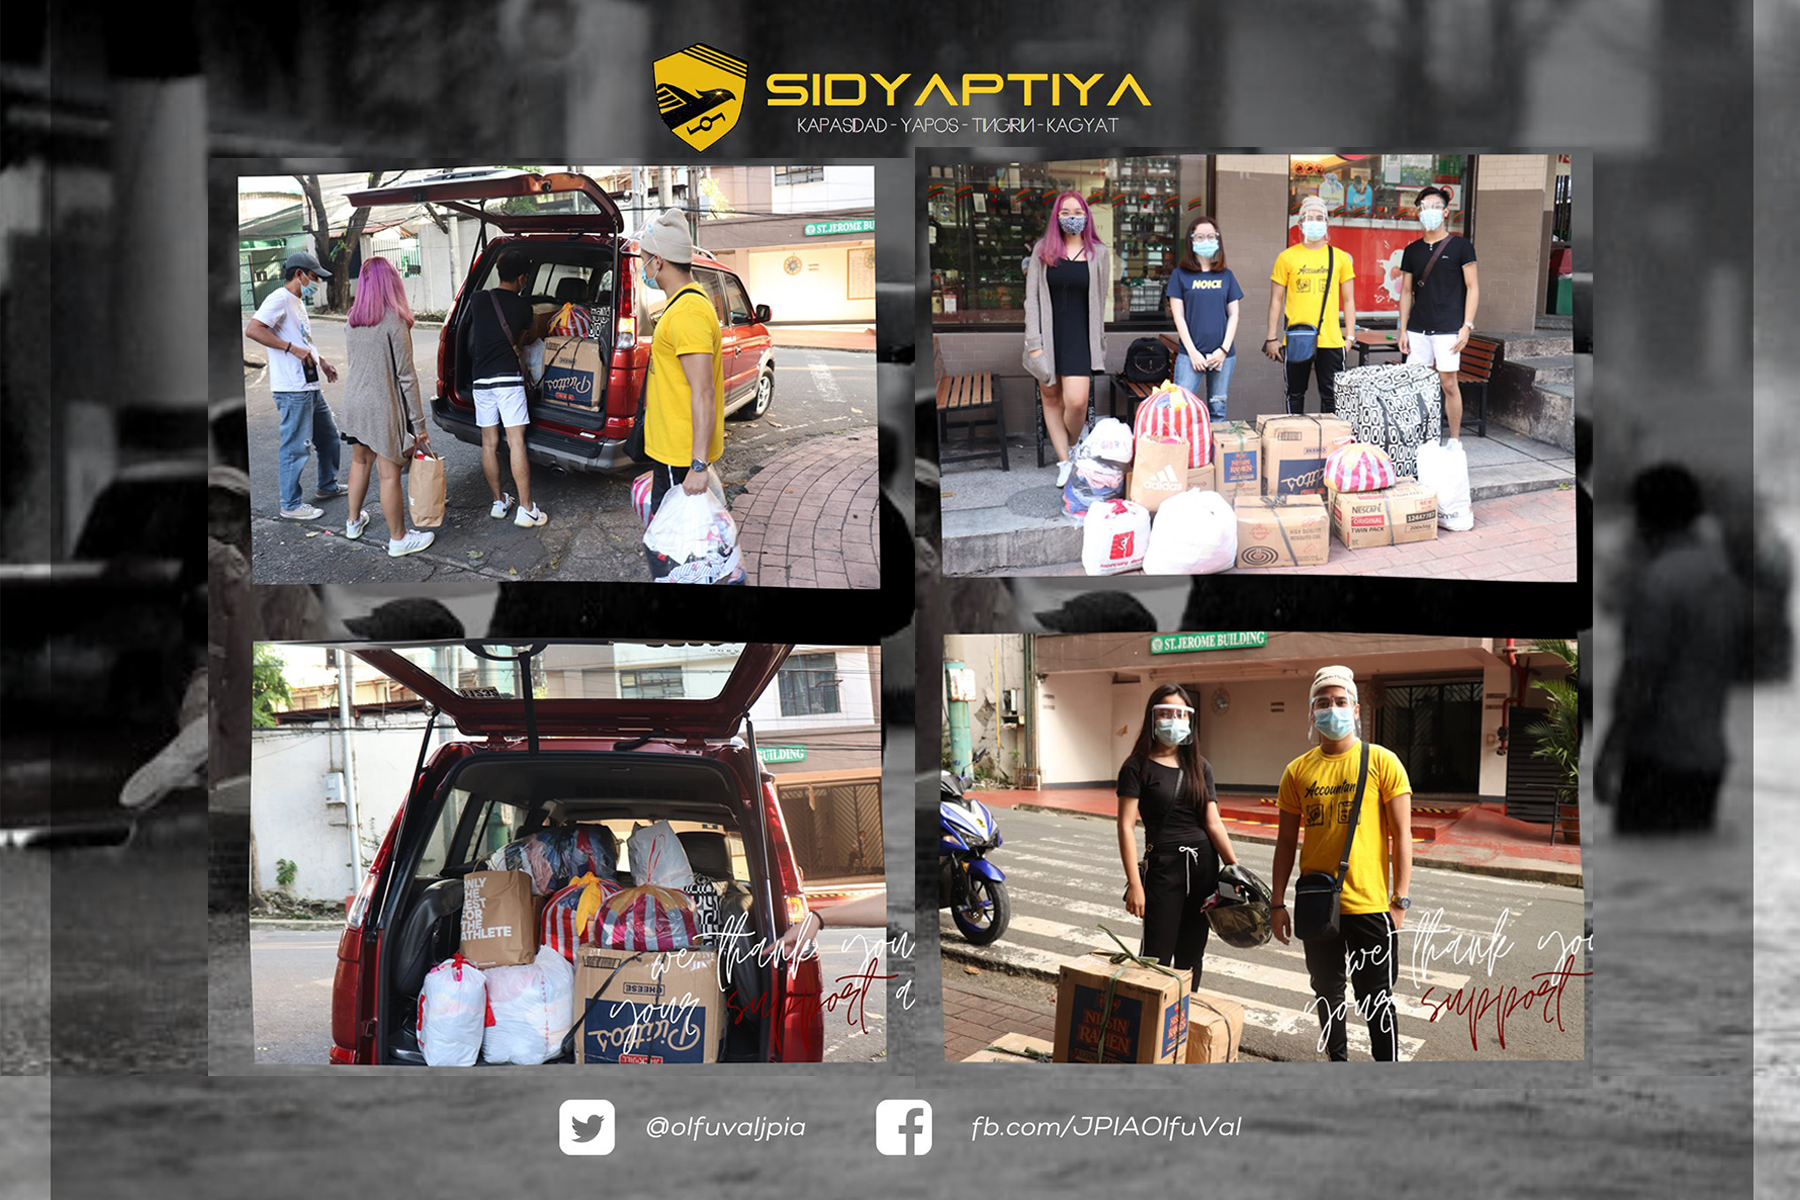 Typhoon Victims get aid through the SIDYAPTIYA Donation Drive initiated by Future Accountants